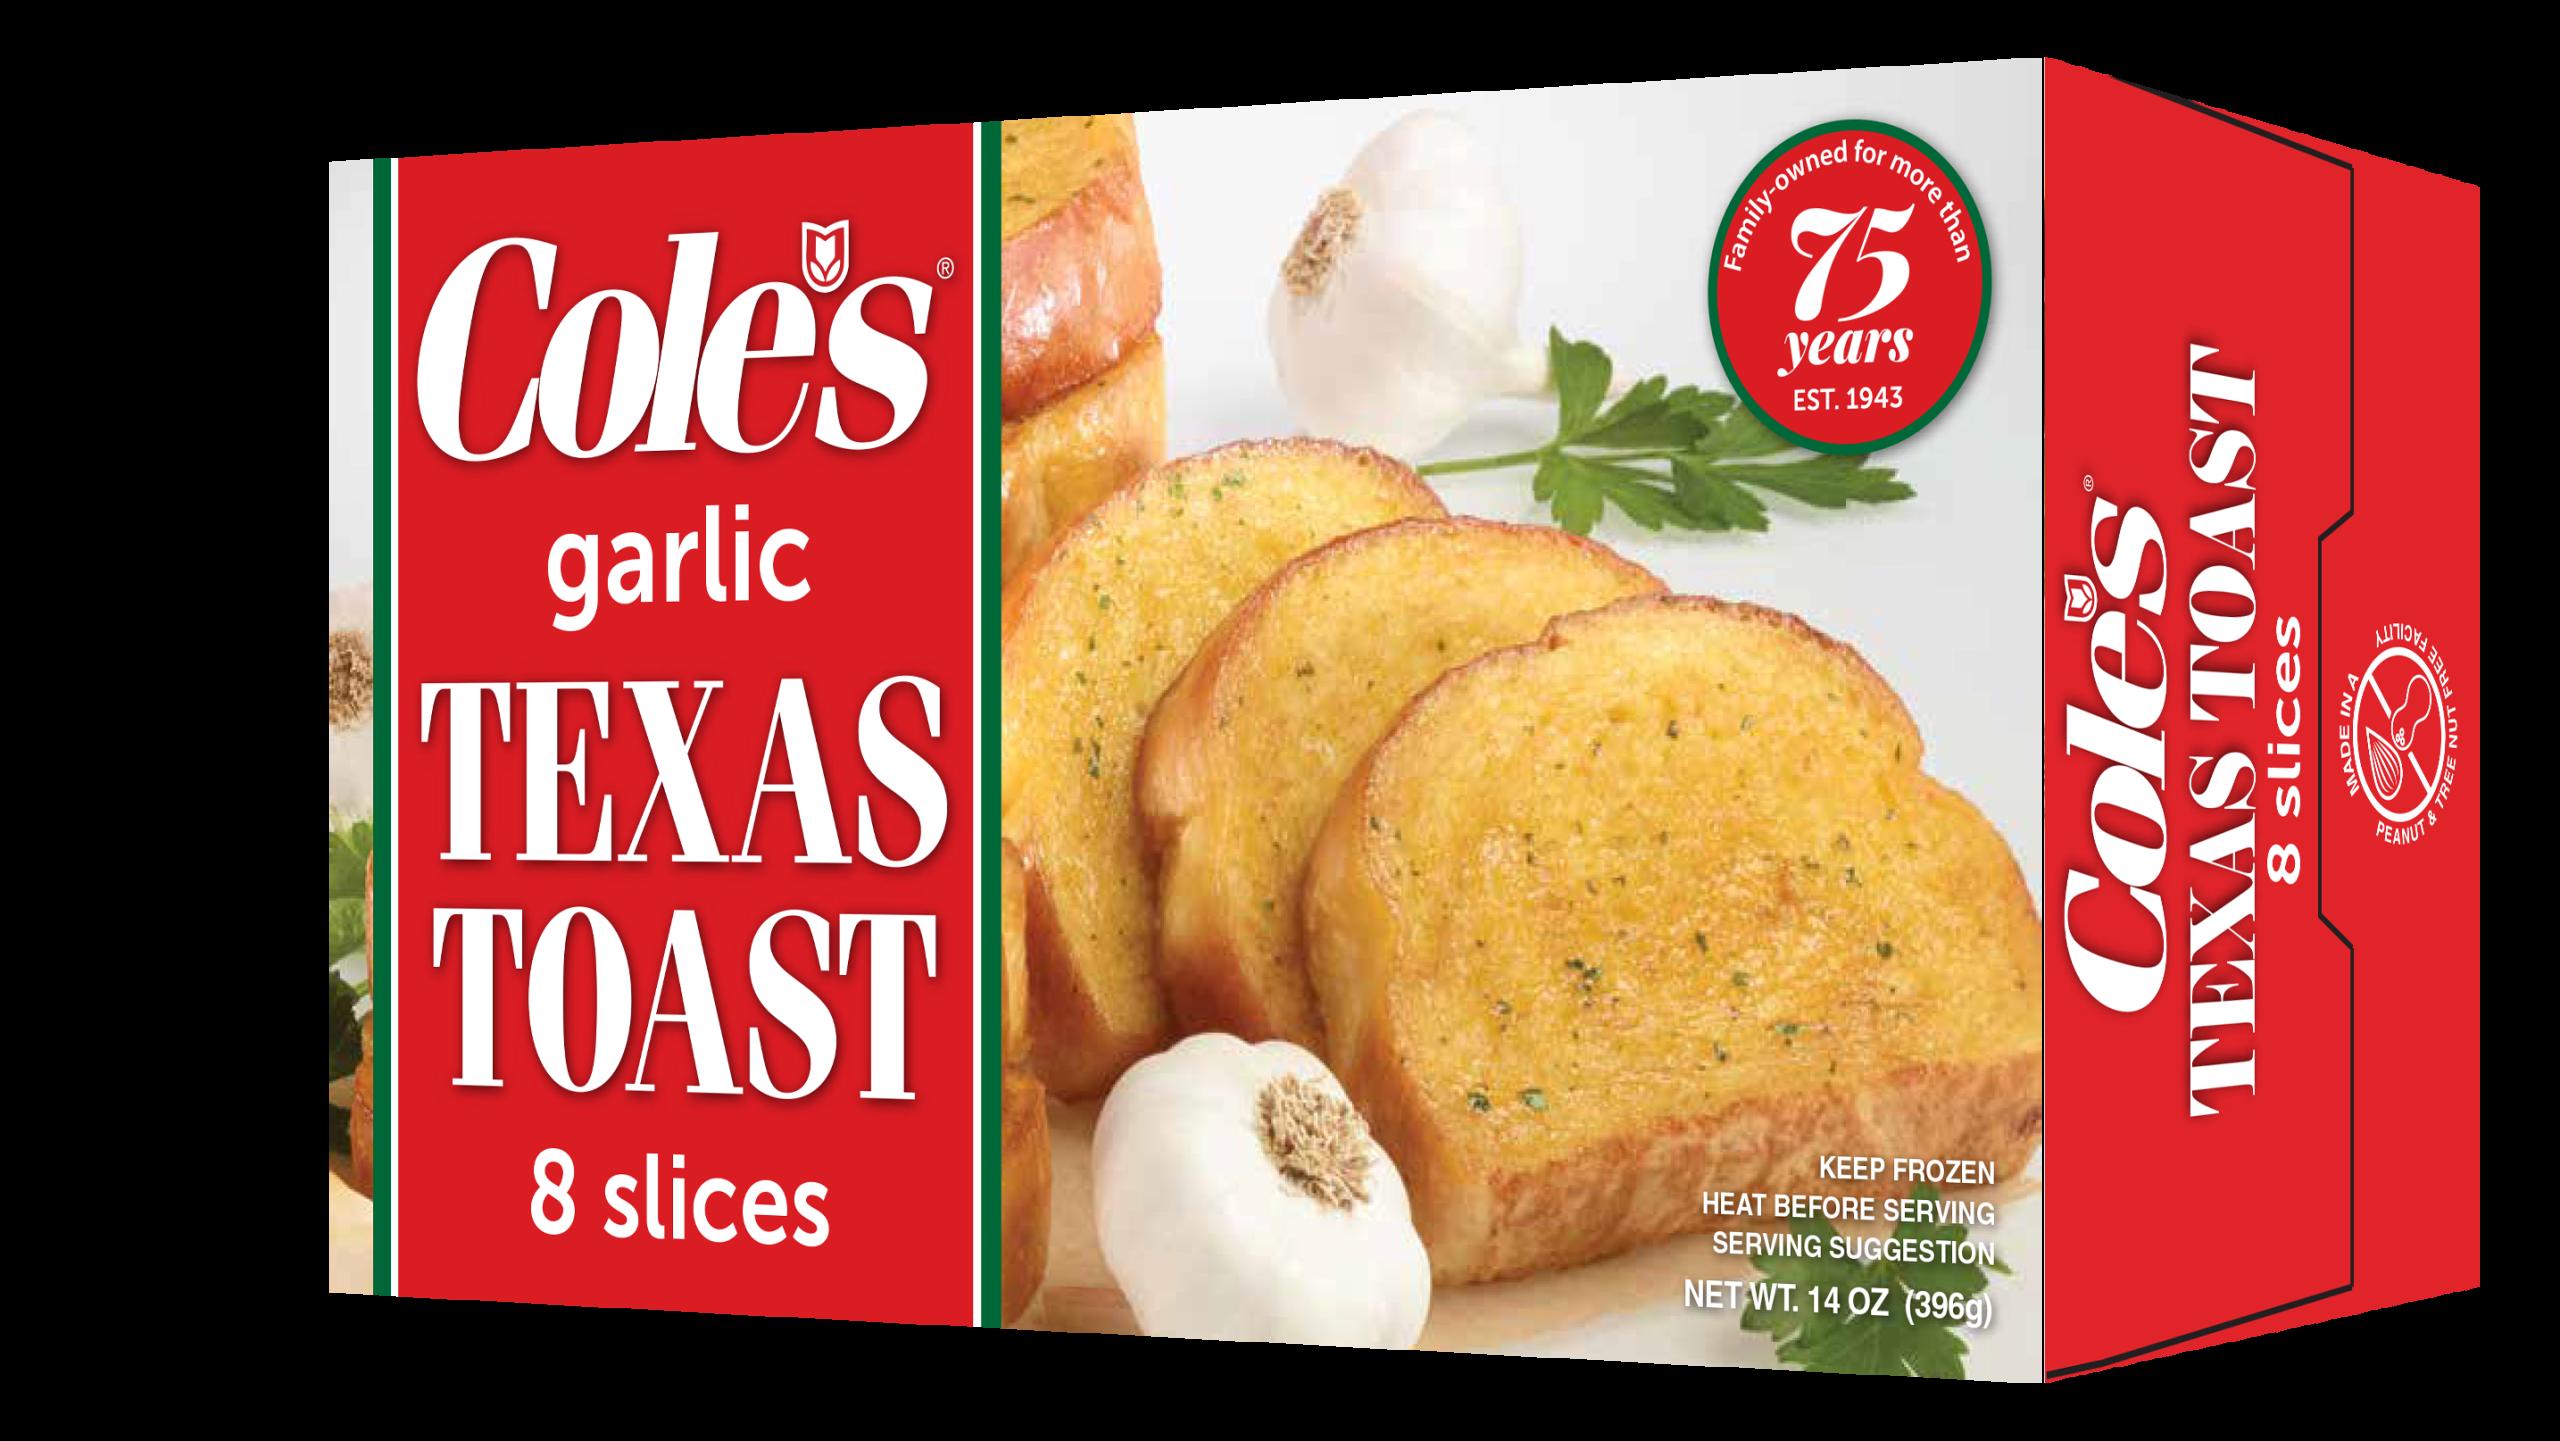 cole s quality foods inc